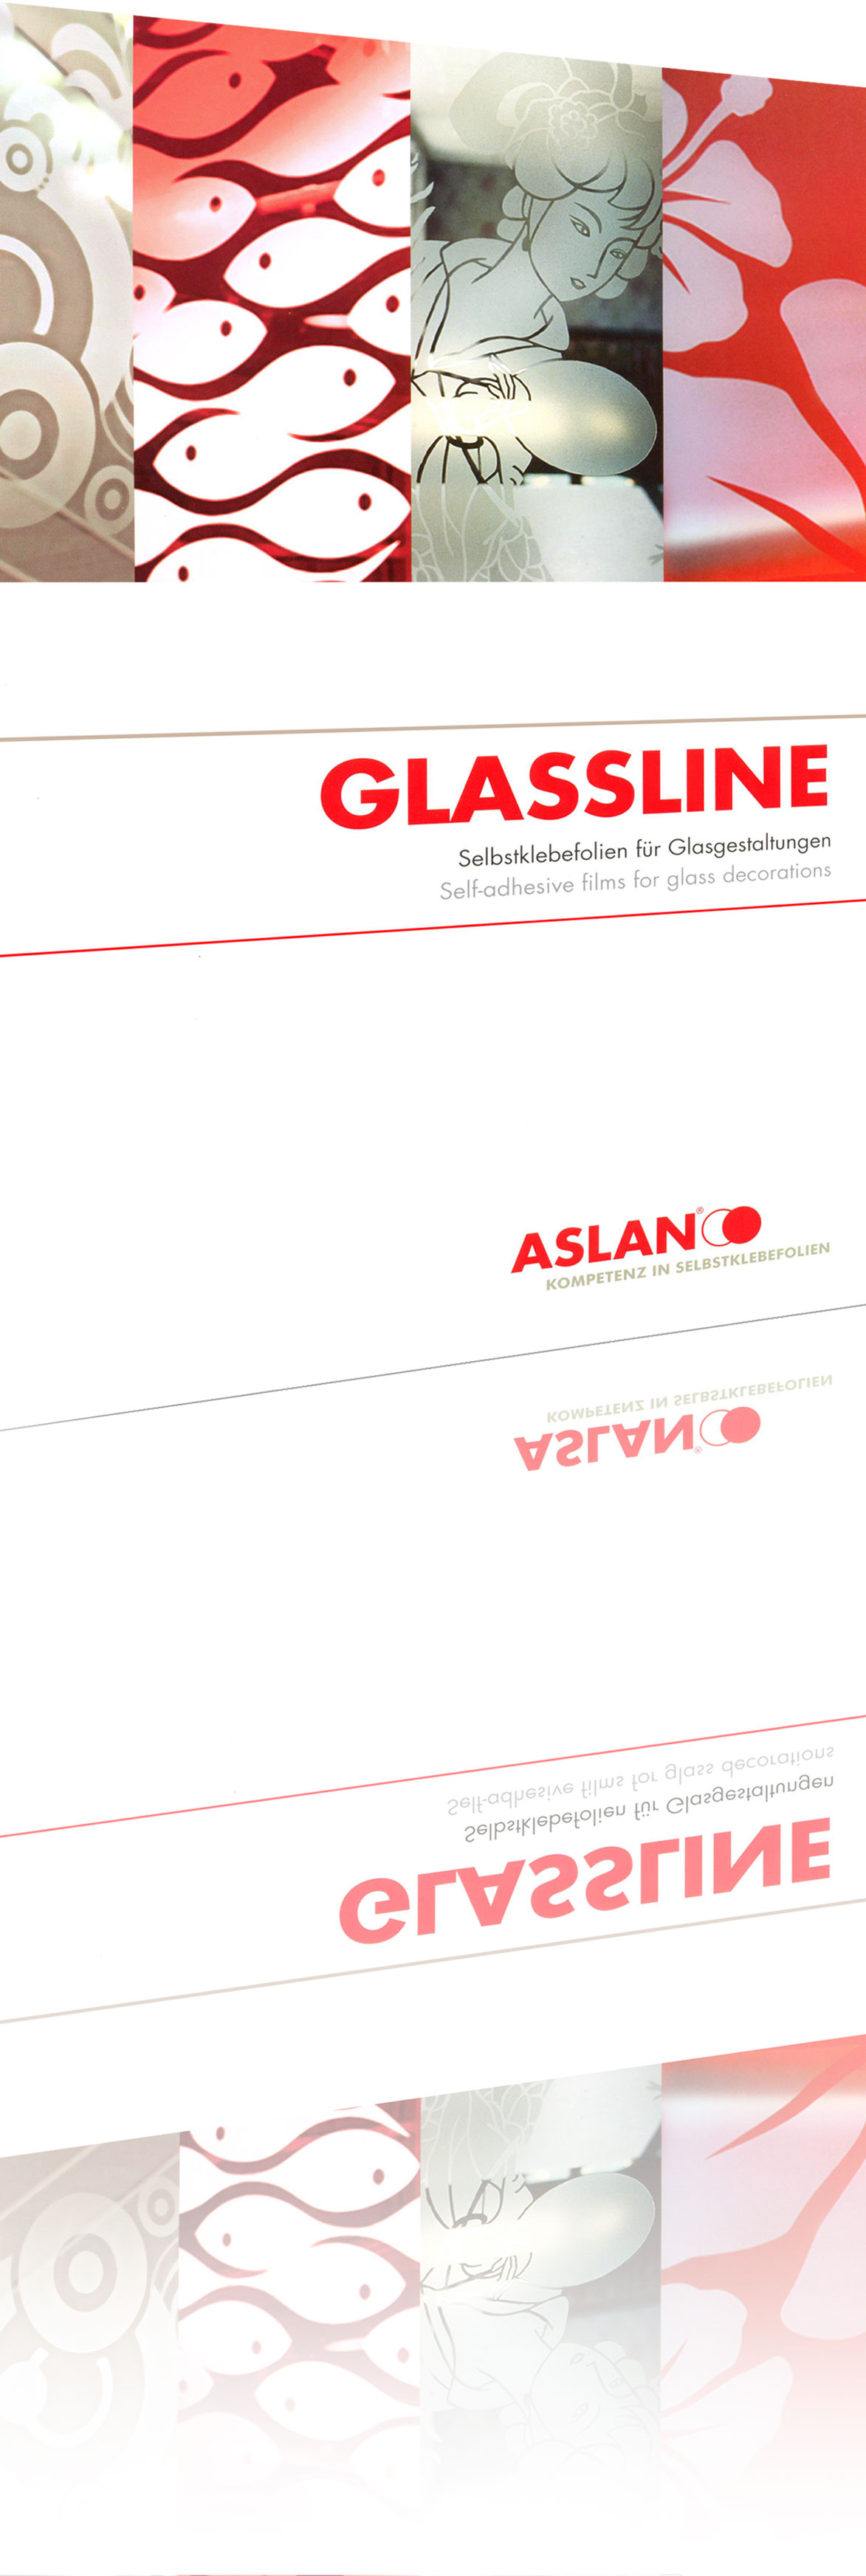 9,88 lfm ASLAN EC55 - Farbige Glasdekorfolie 122 cm Beige 22391K ...